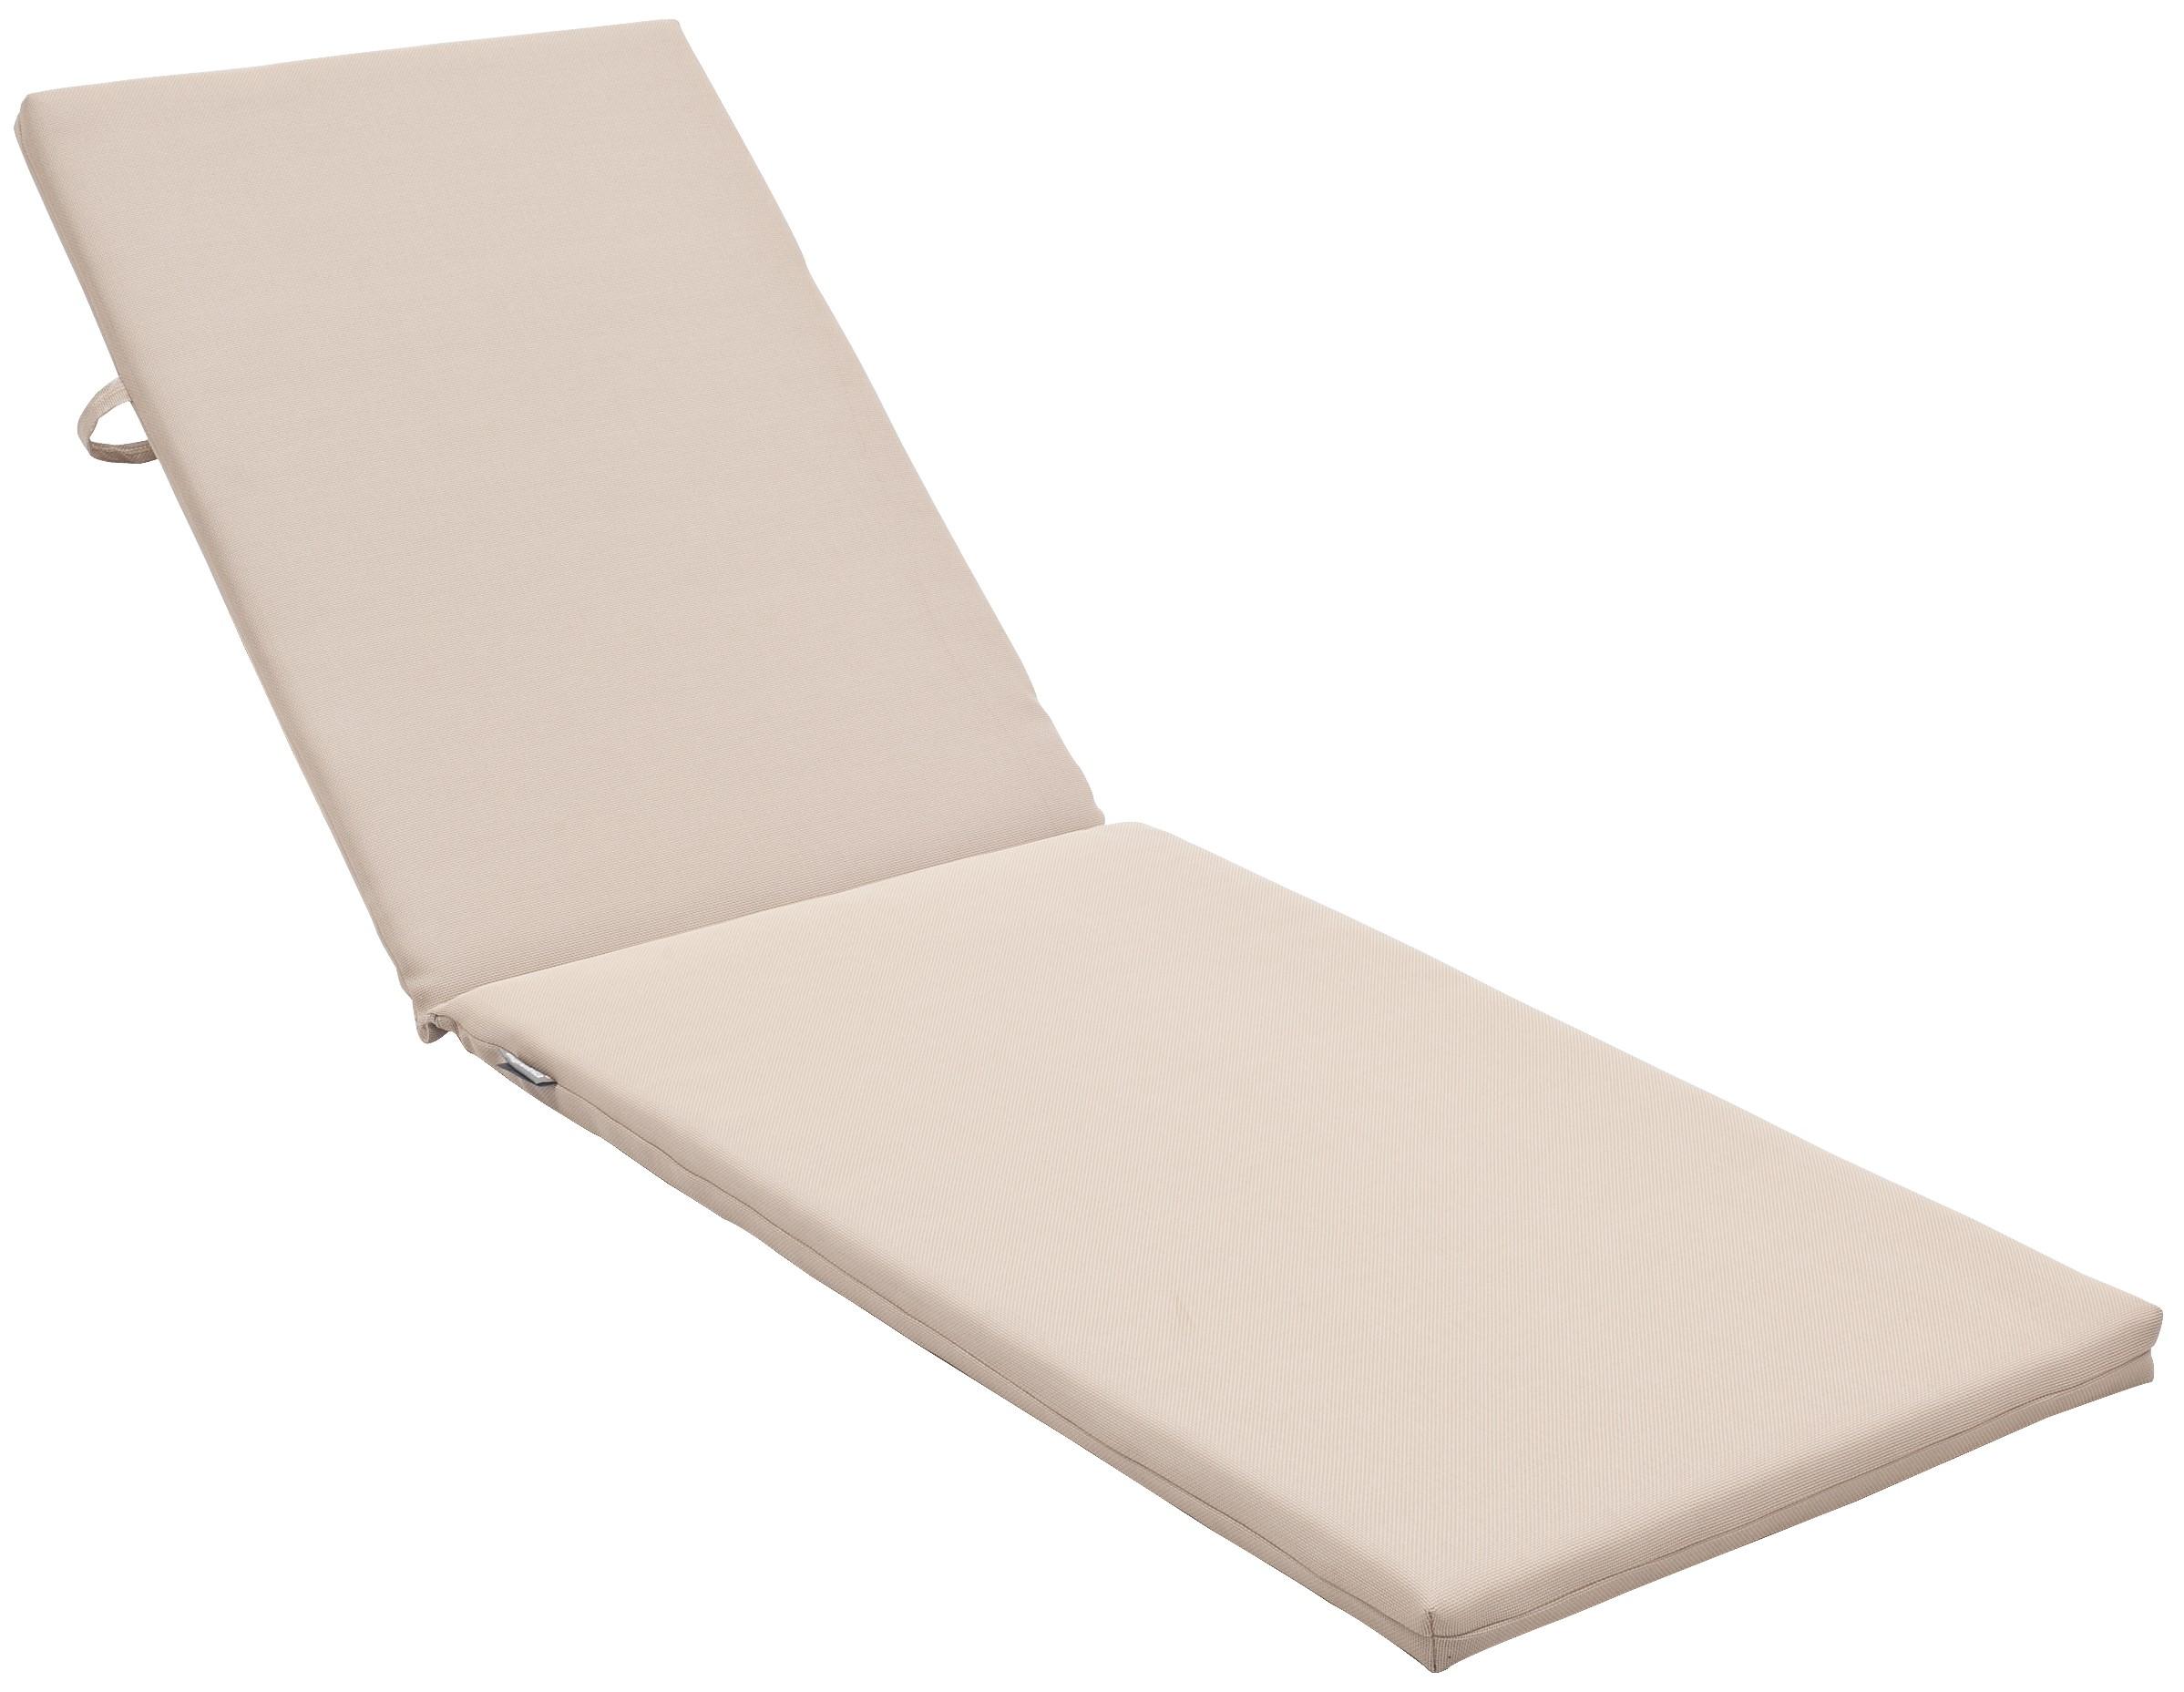 Lounge Ezpeleta Cojín beige  Marrones Textiline